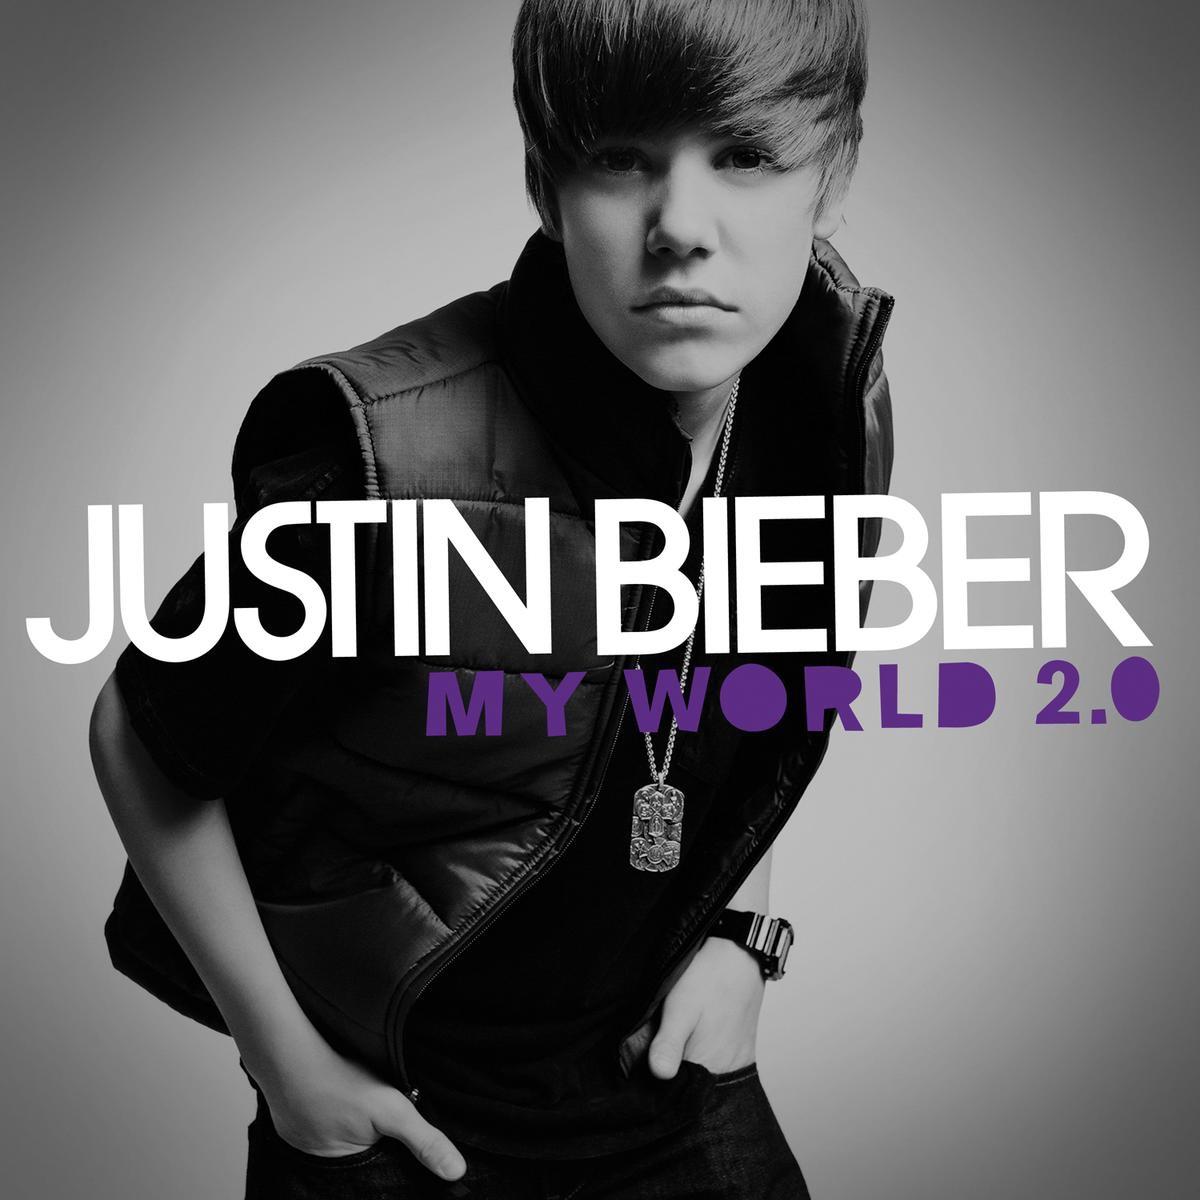 Justin Bieber - My World 2.0 (Bonus Track Version) Cover